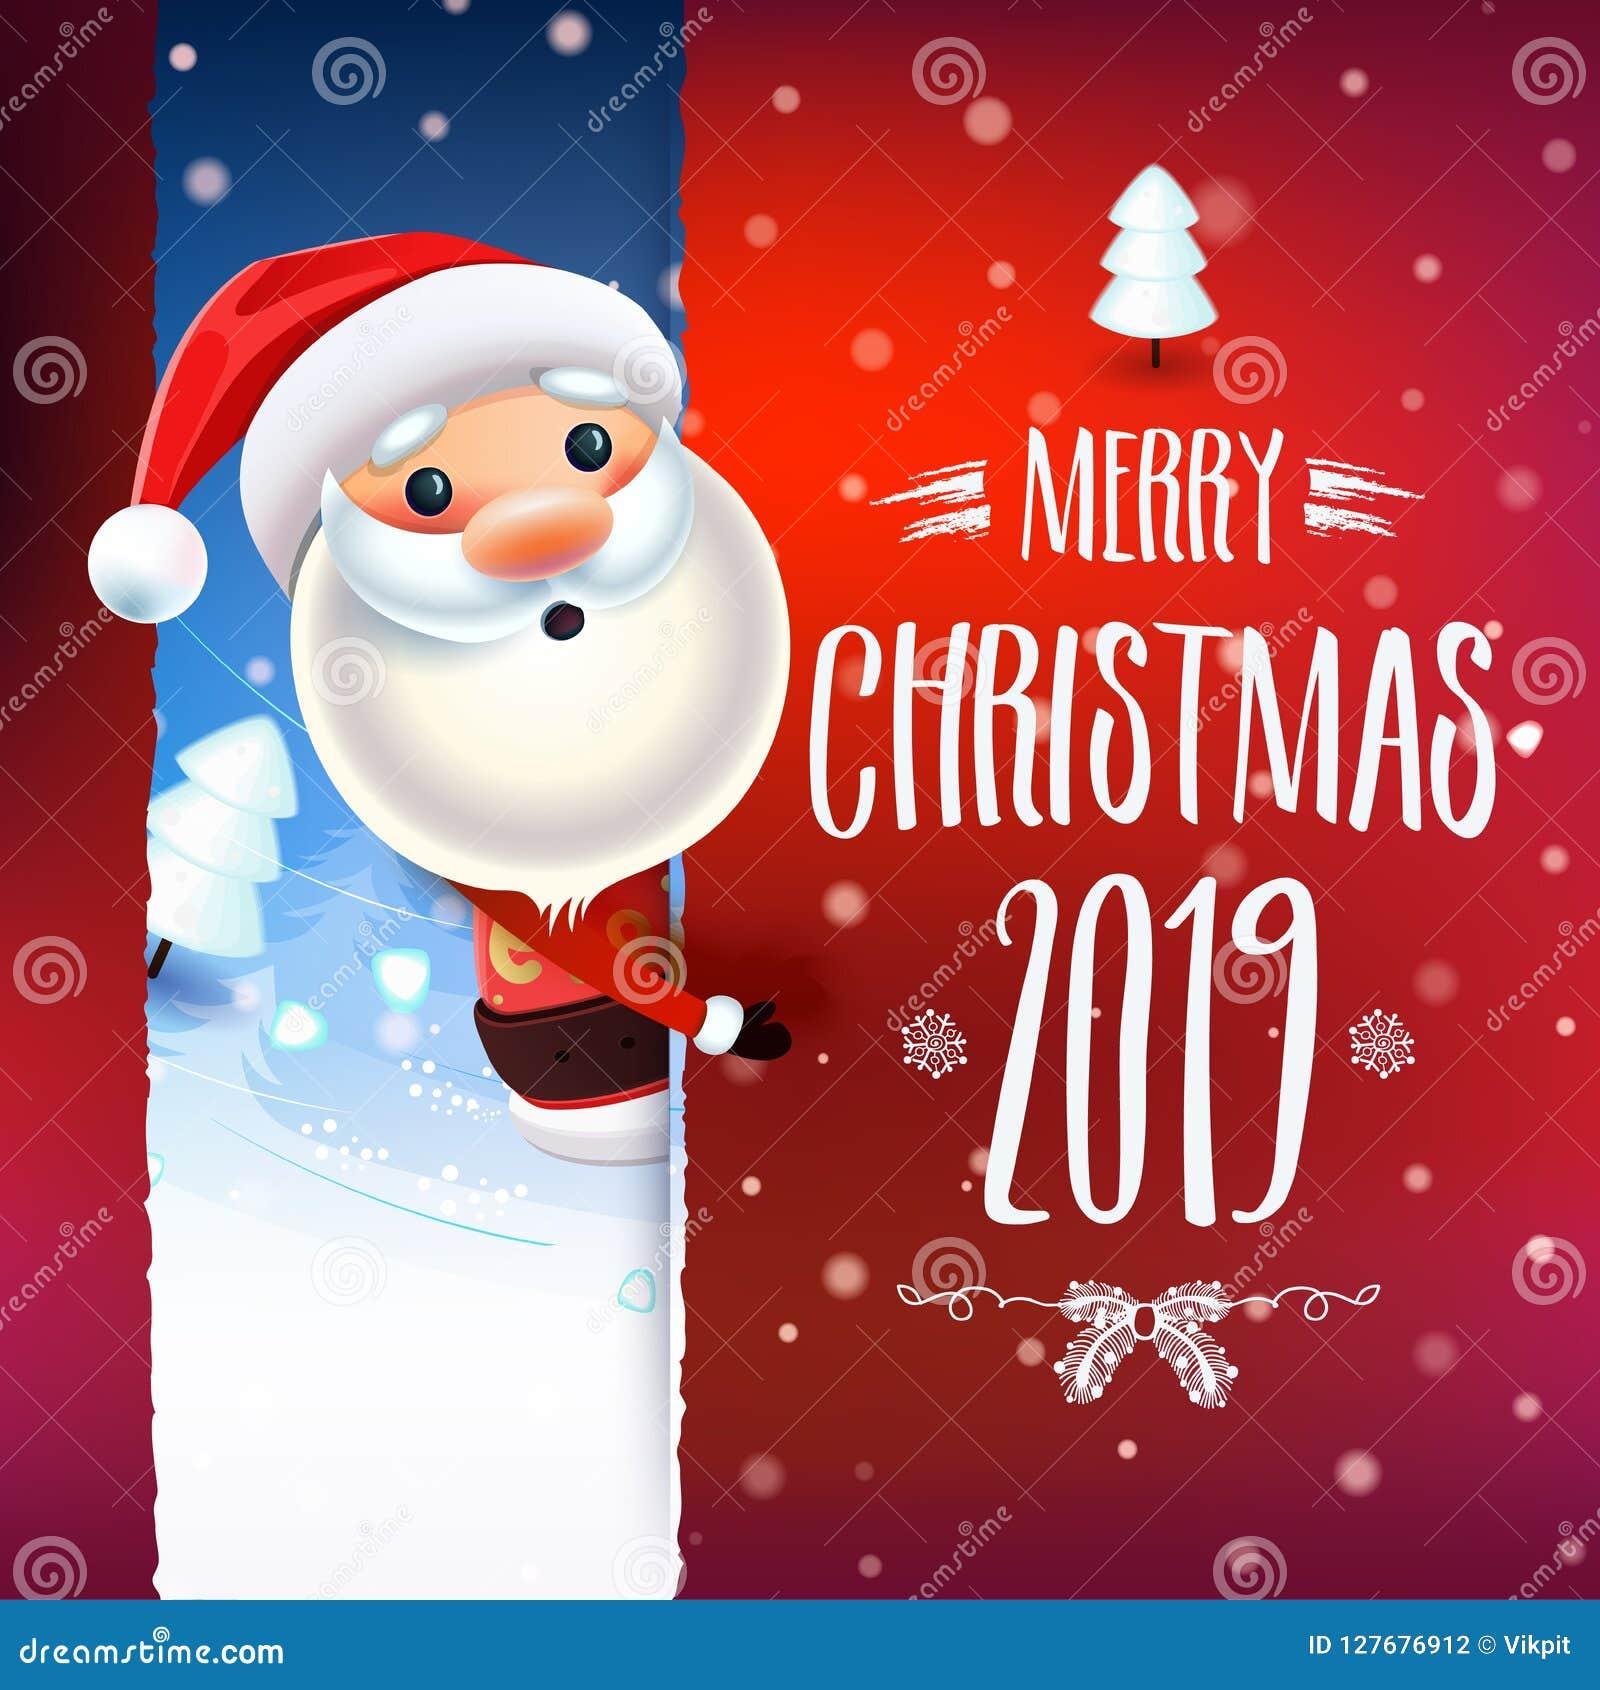 Merry Christmas 2019.2019 New Year Merry Christmas Symbol Stock Vector